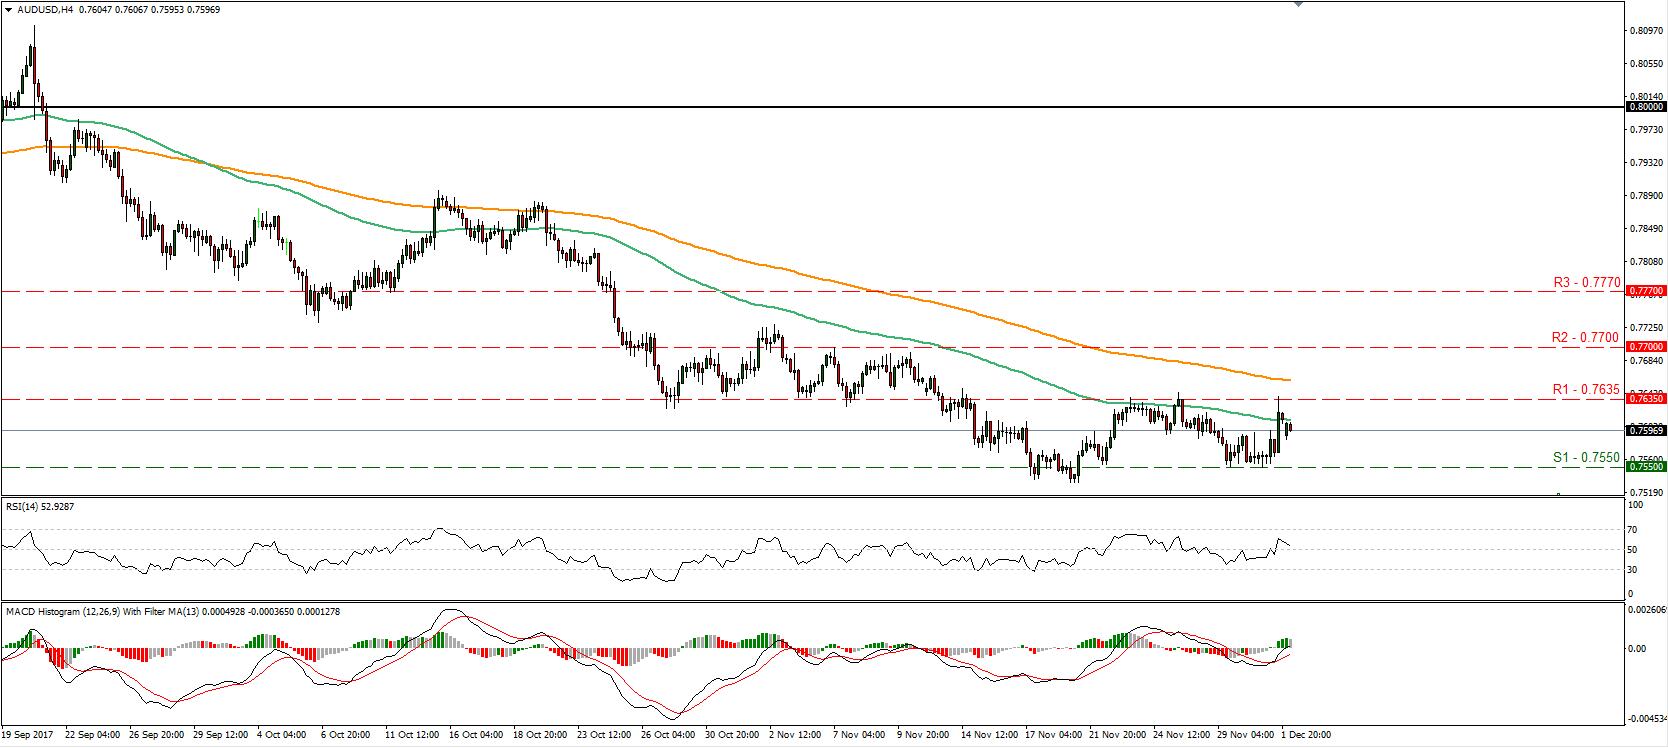 AUD/USD 4 Dec 2017 | Econ Alerts